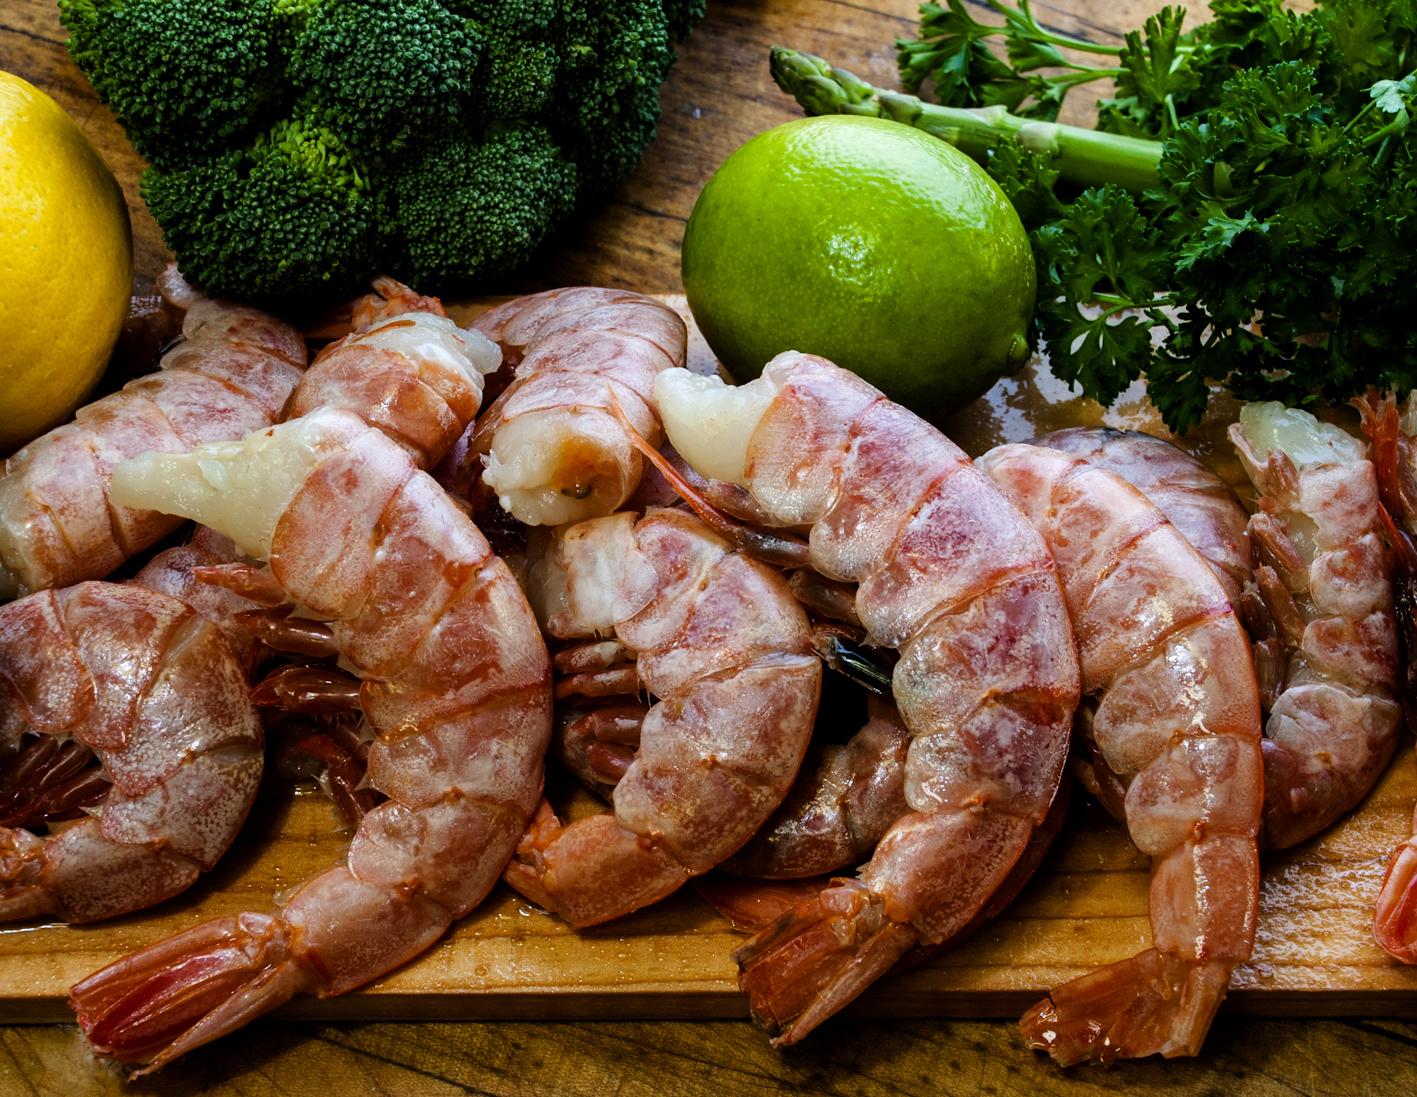 Royal Red Shrimp-Jumbo/Veinless 2.3lb Bag